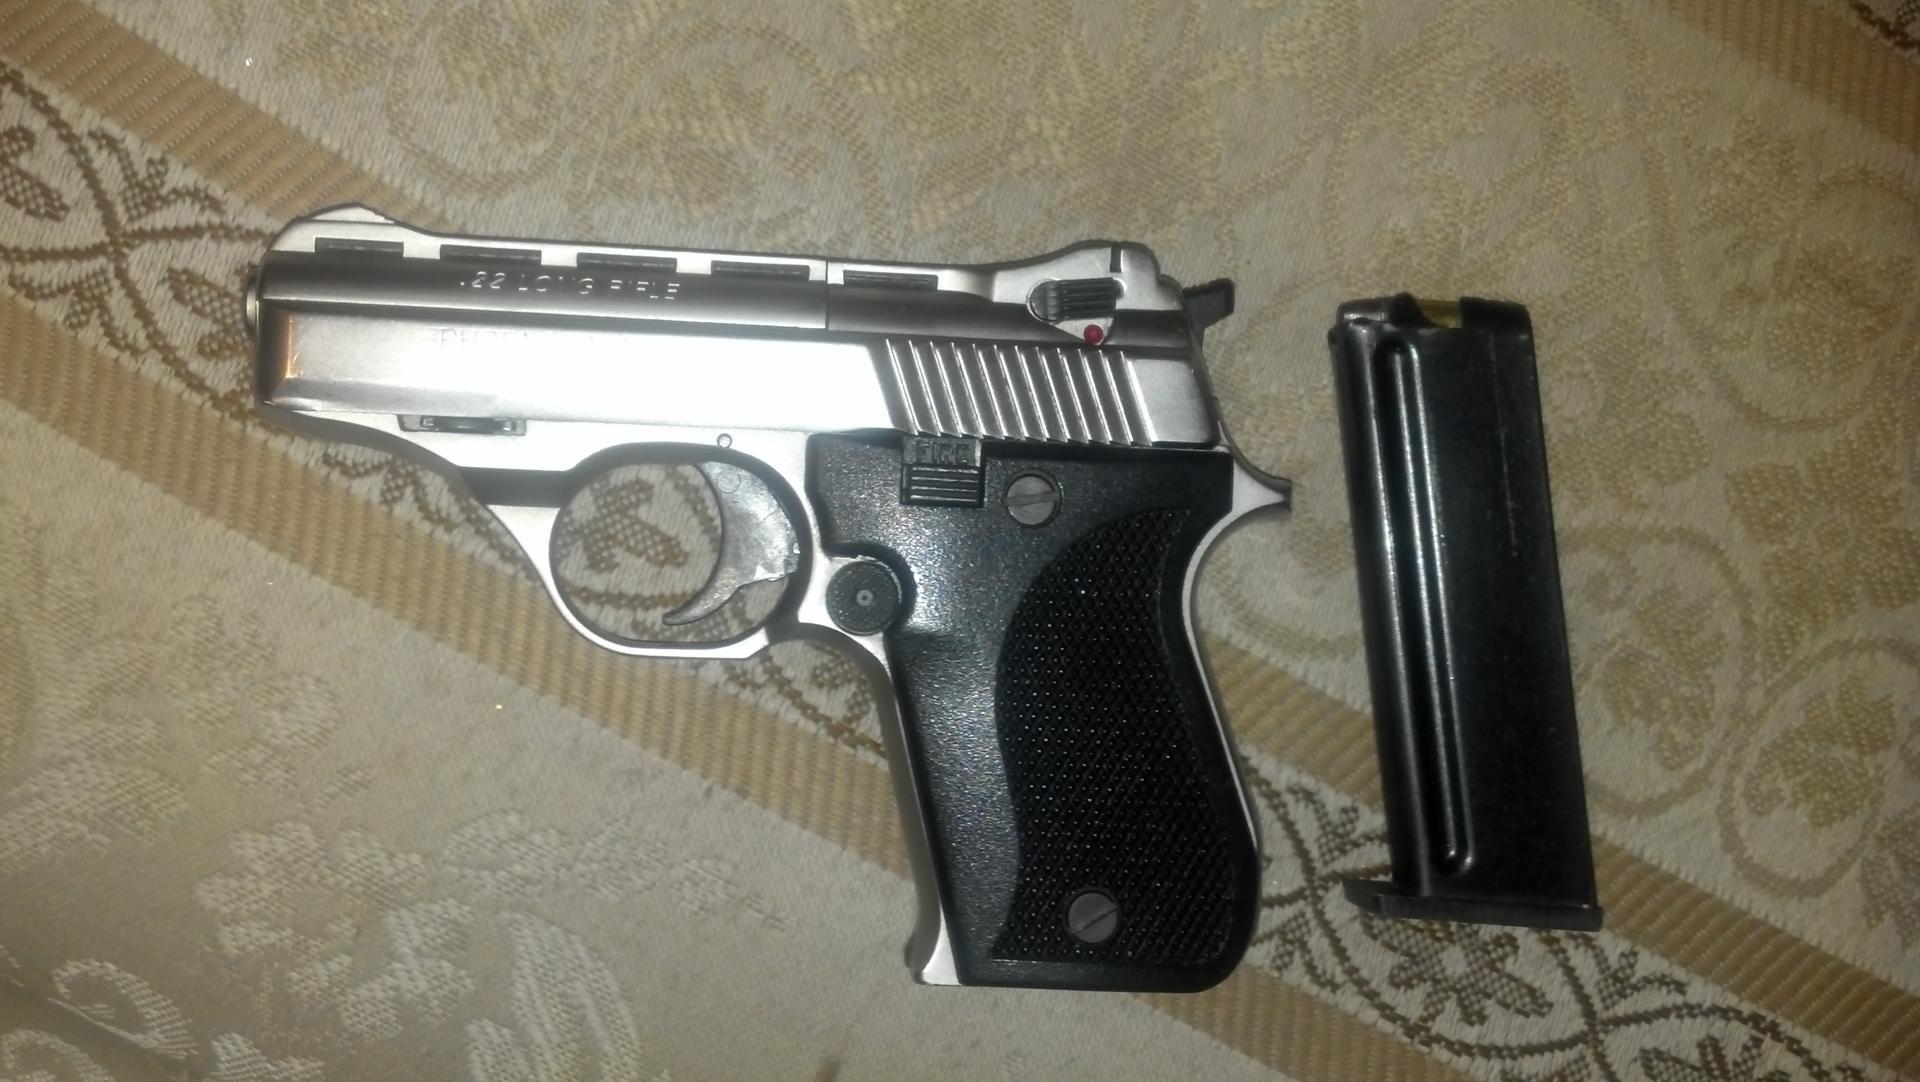 Escuadra Calibre 22mm Armas De Fuego Pinterest